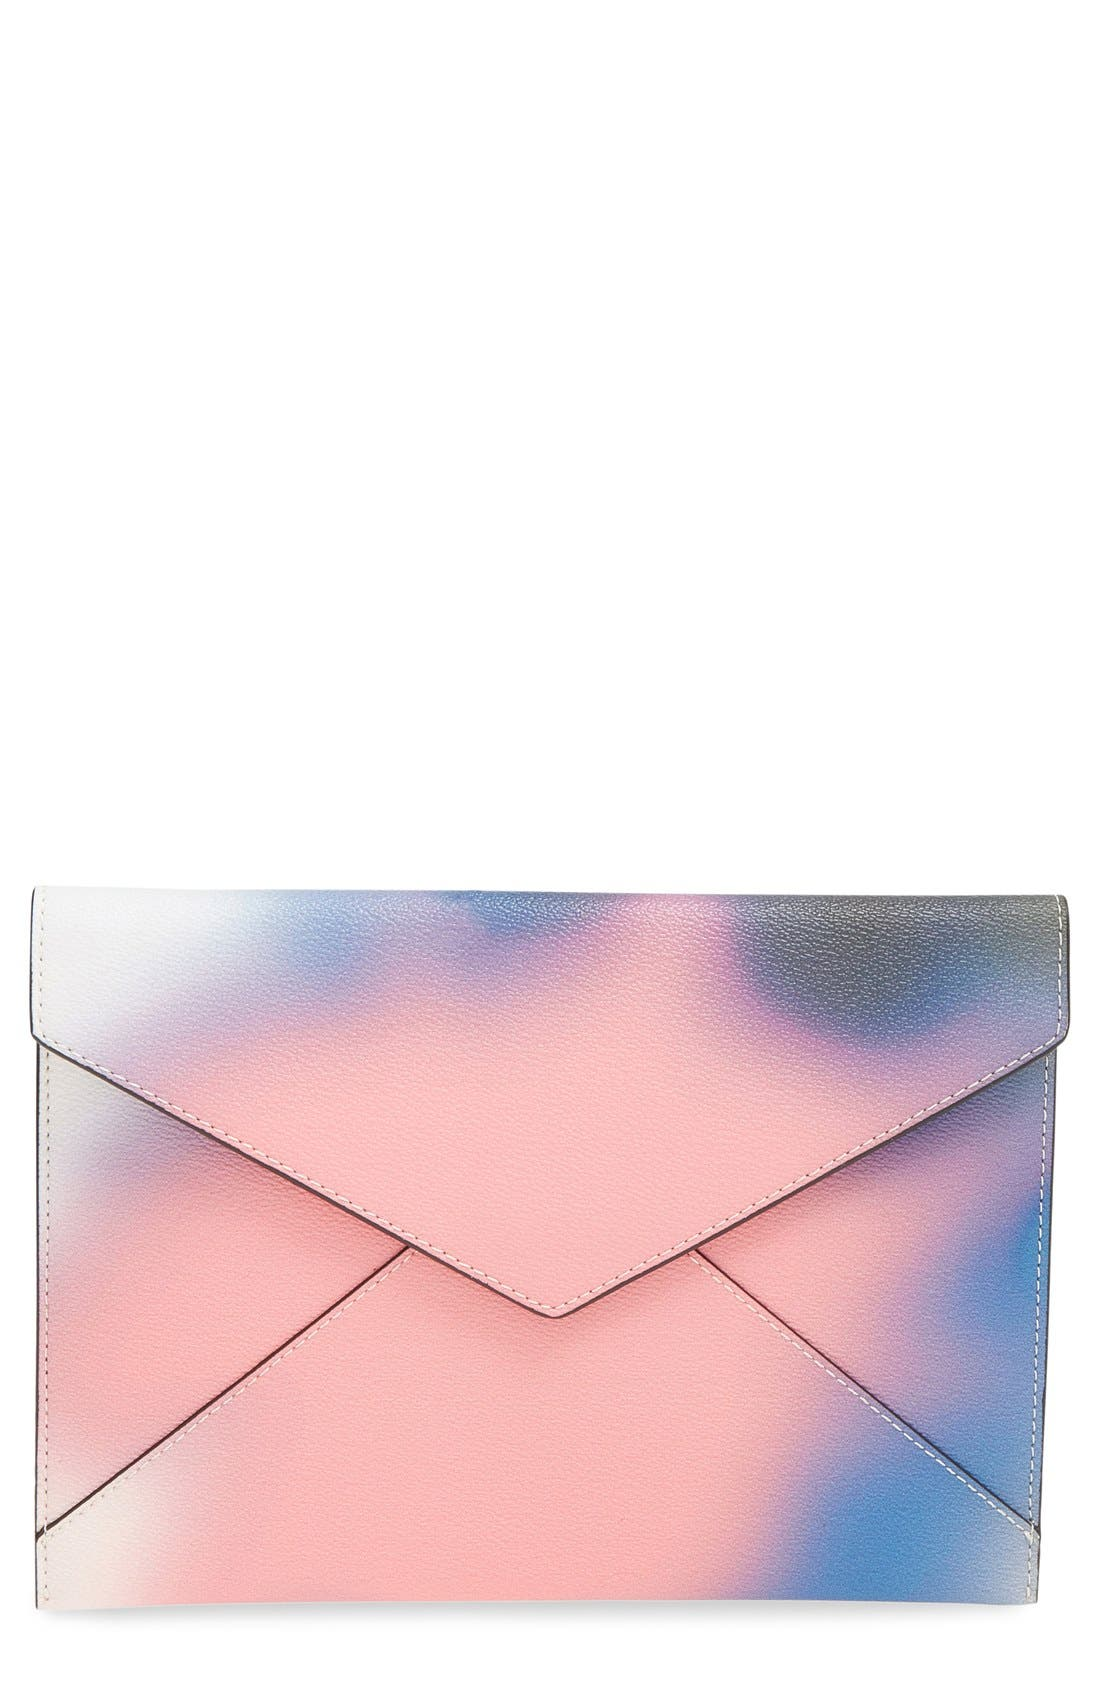 Alternate Image 1 Selected - Rebecca Minkoff 'Leo' Envelope Clutch